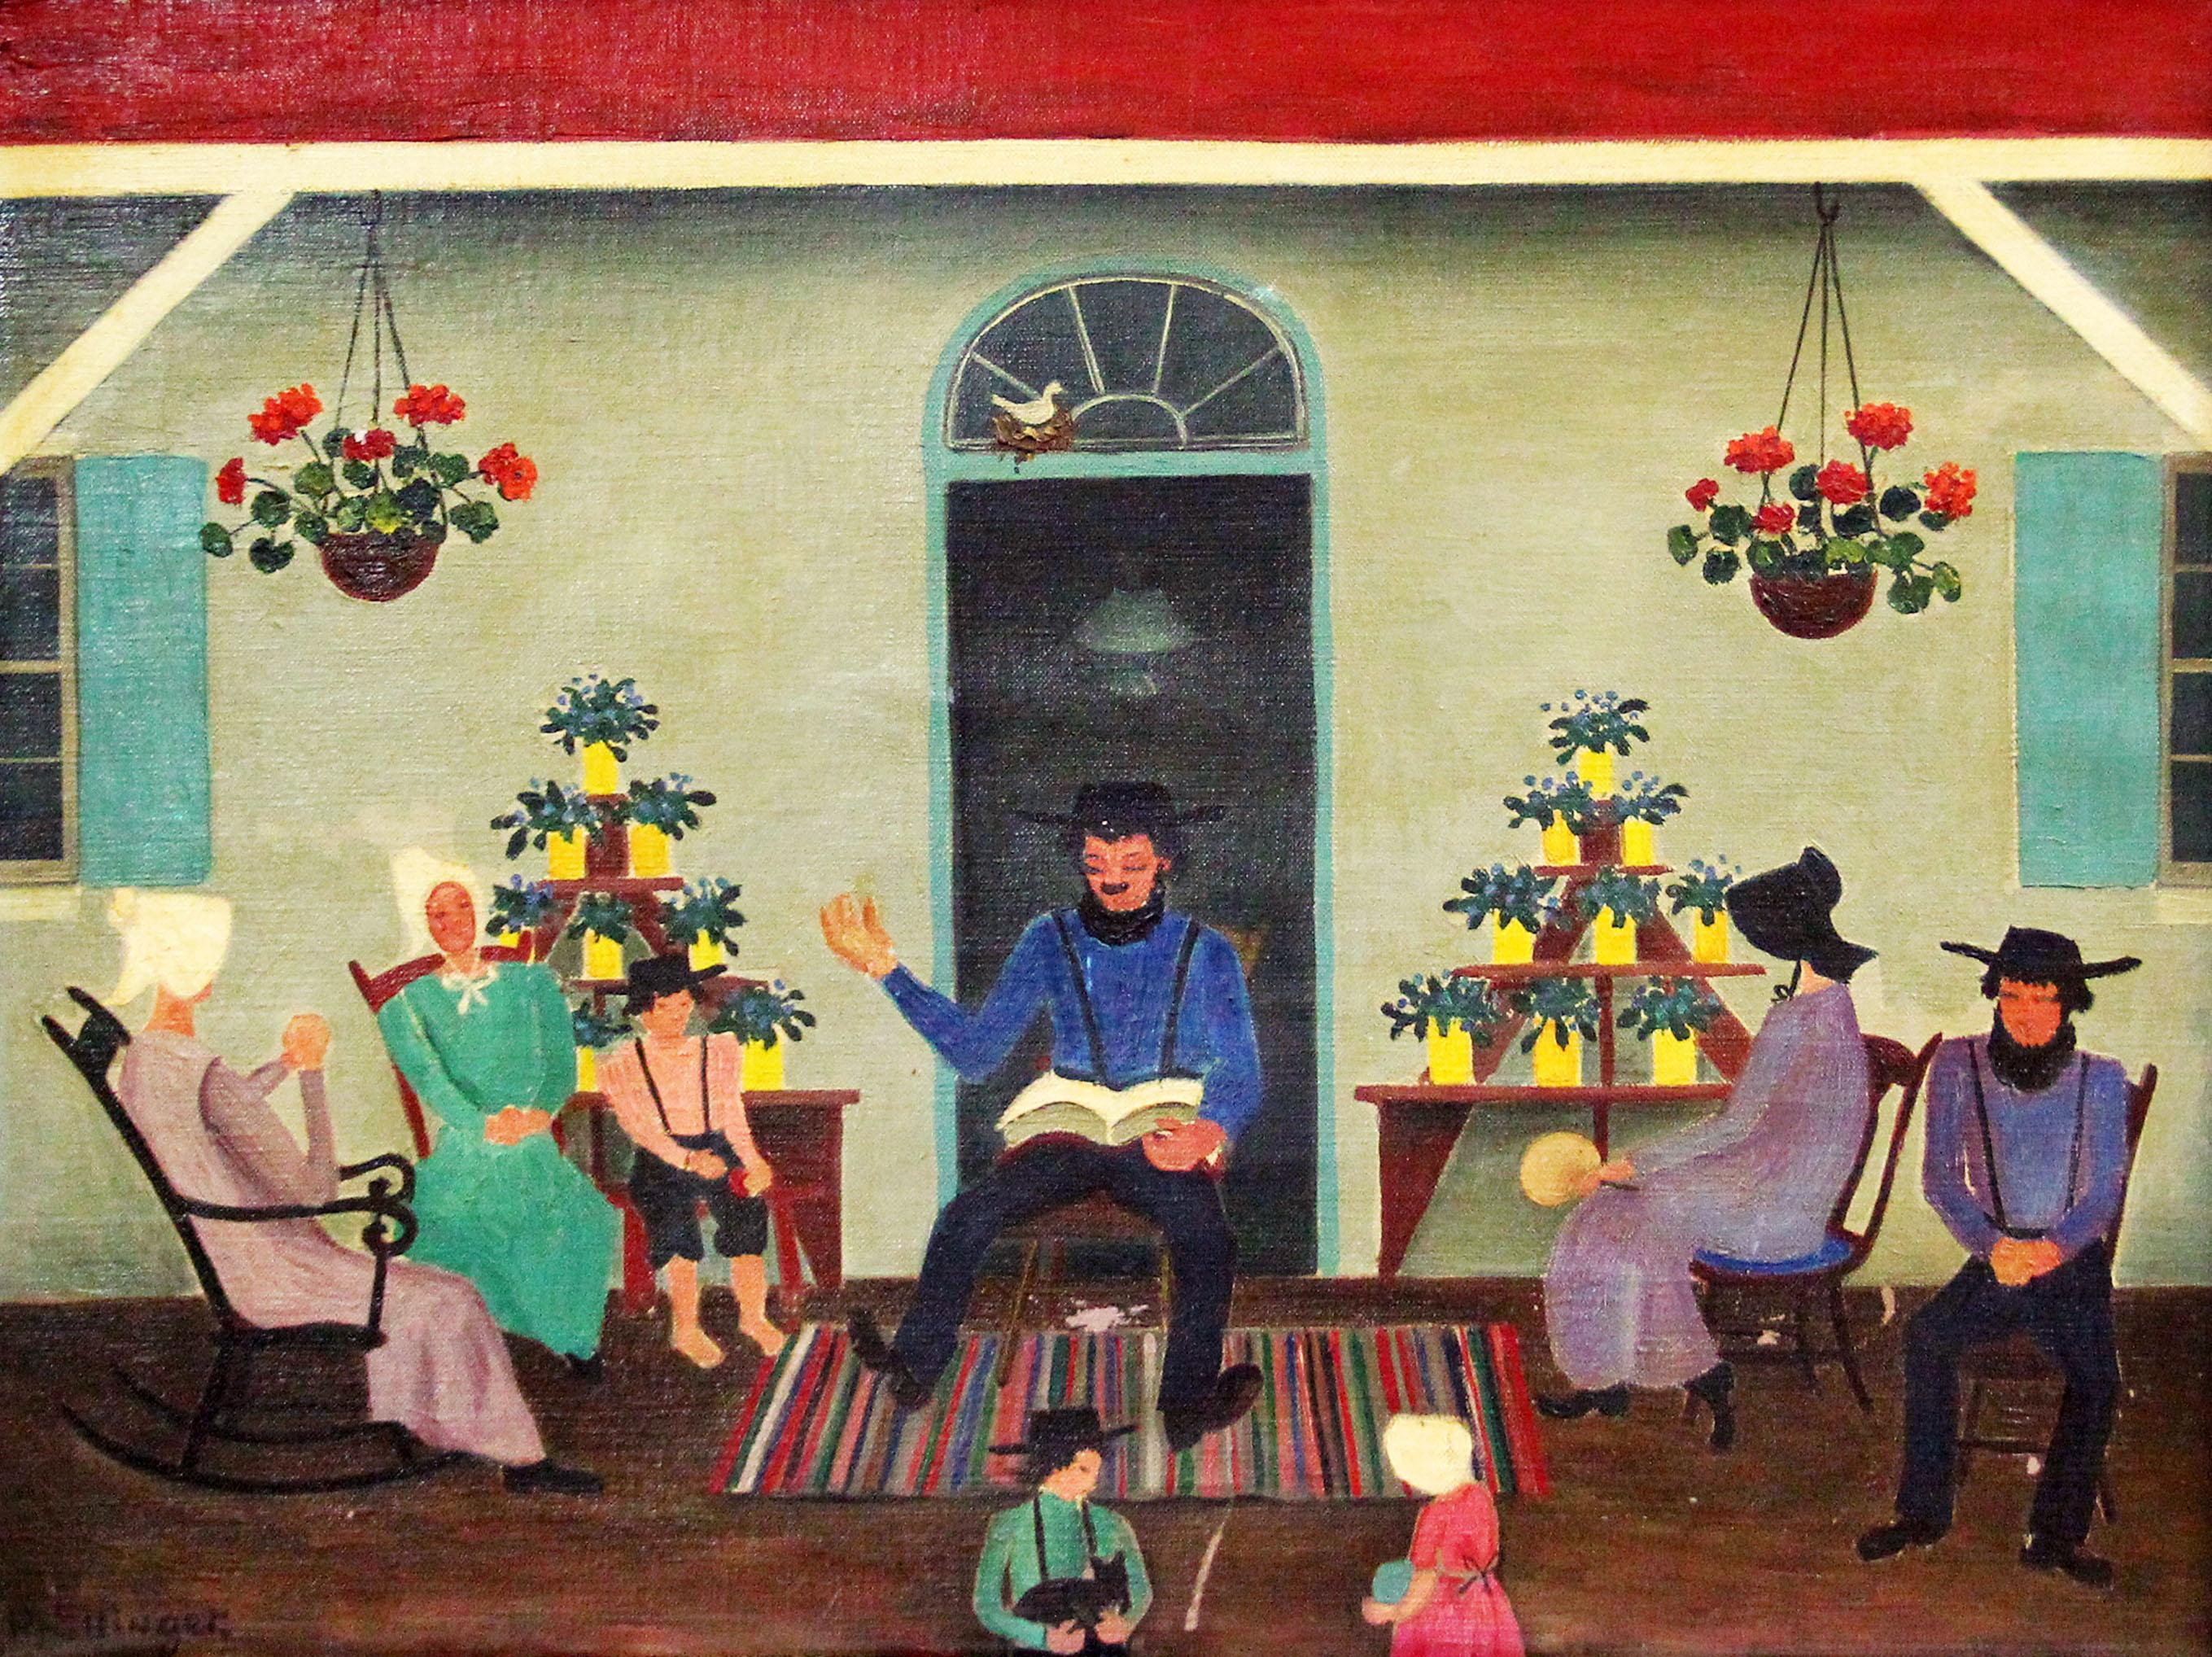 Day of Rest, Folk Art Family Scene, Pennsylvania Dutch, Amish Interior